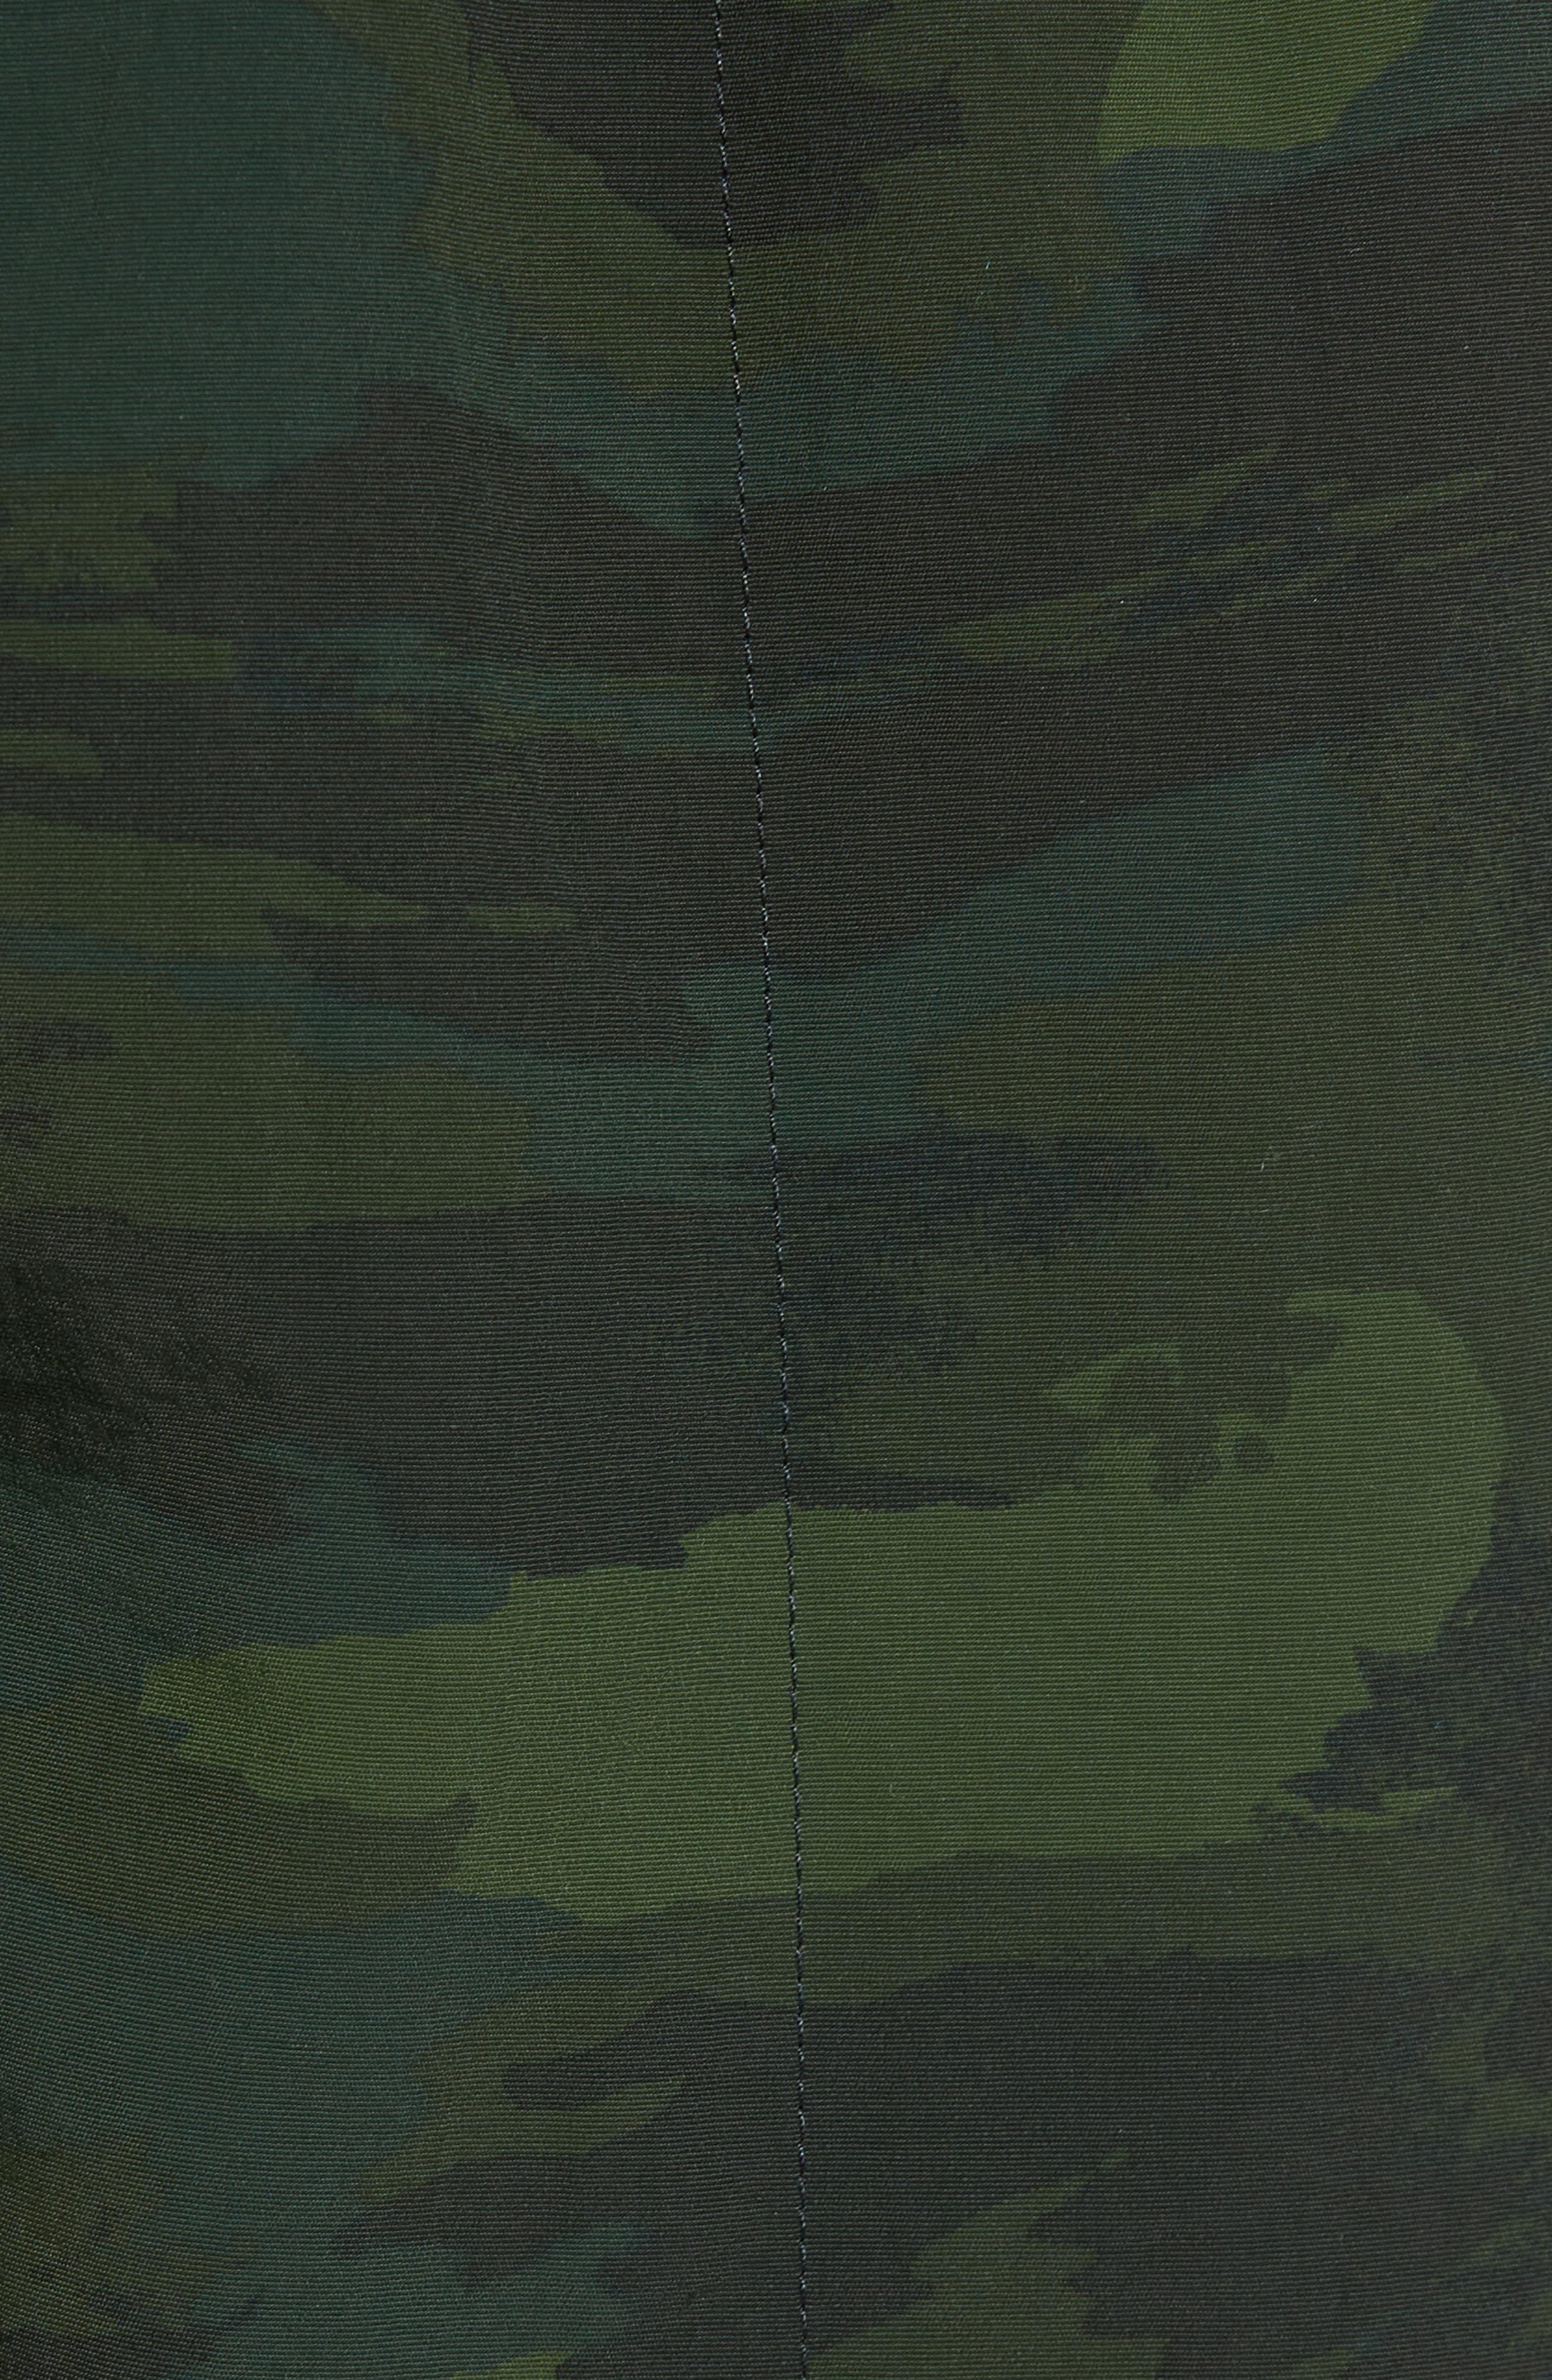 Baggies Longs Swim Trunks,                             Alternate thumbnail 5, color,                             El Nino Camo Carbon